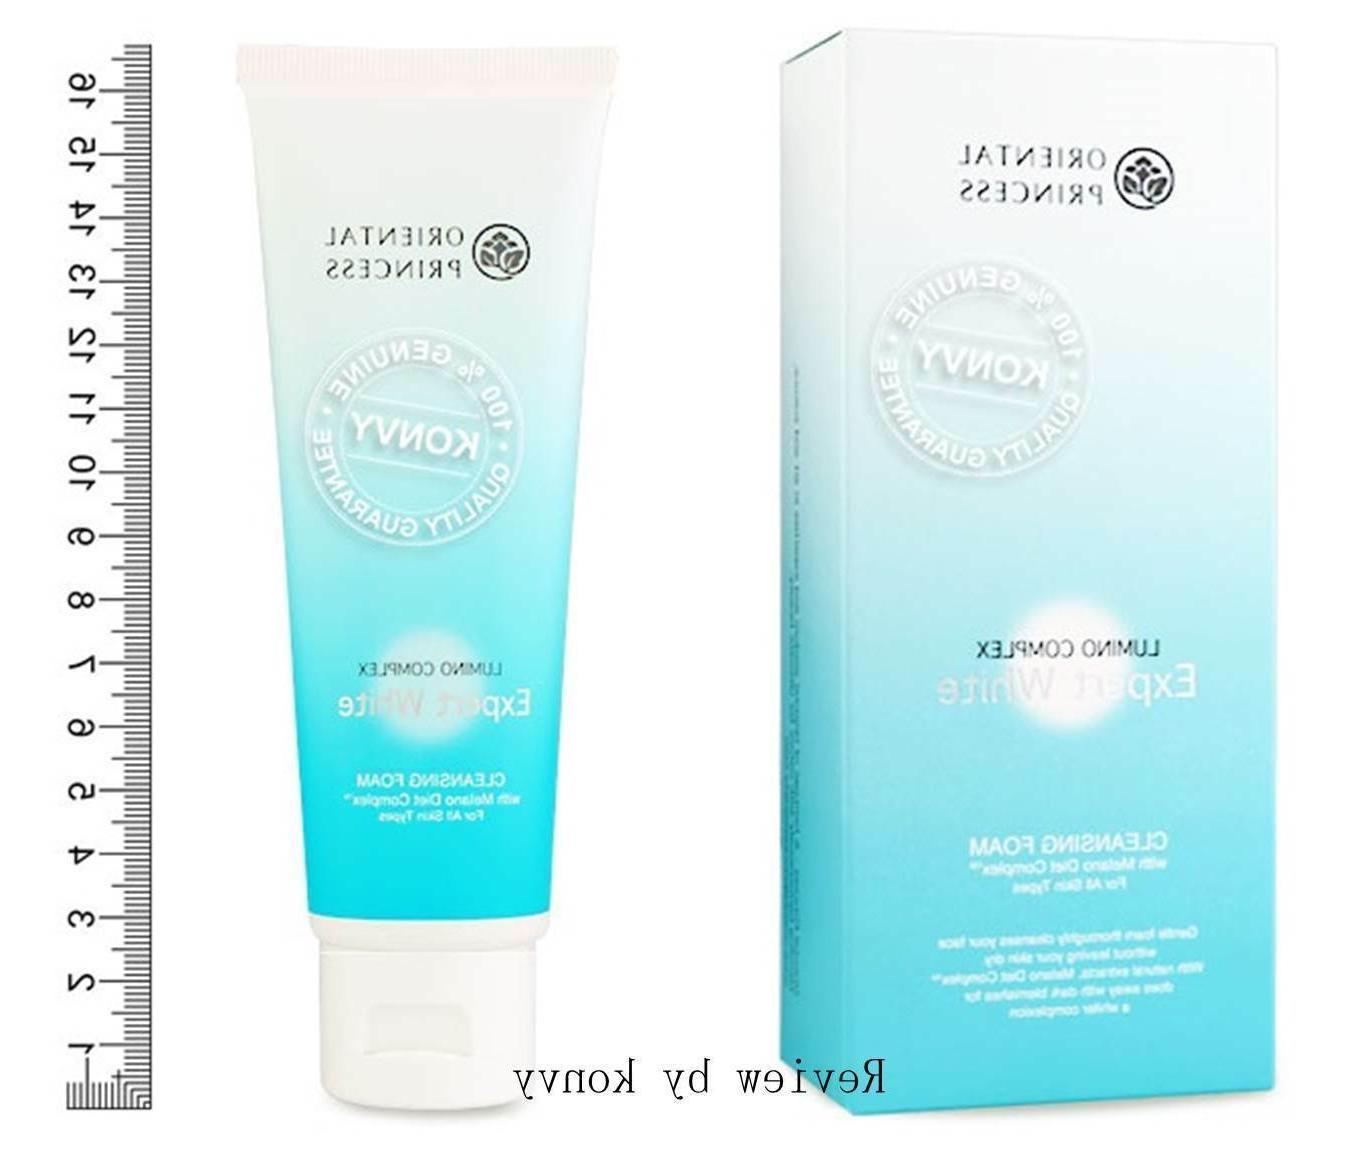 Lumino Complex Day&Night Moisturiser, Skin Care